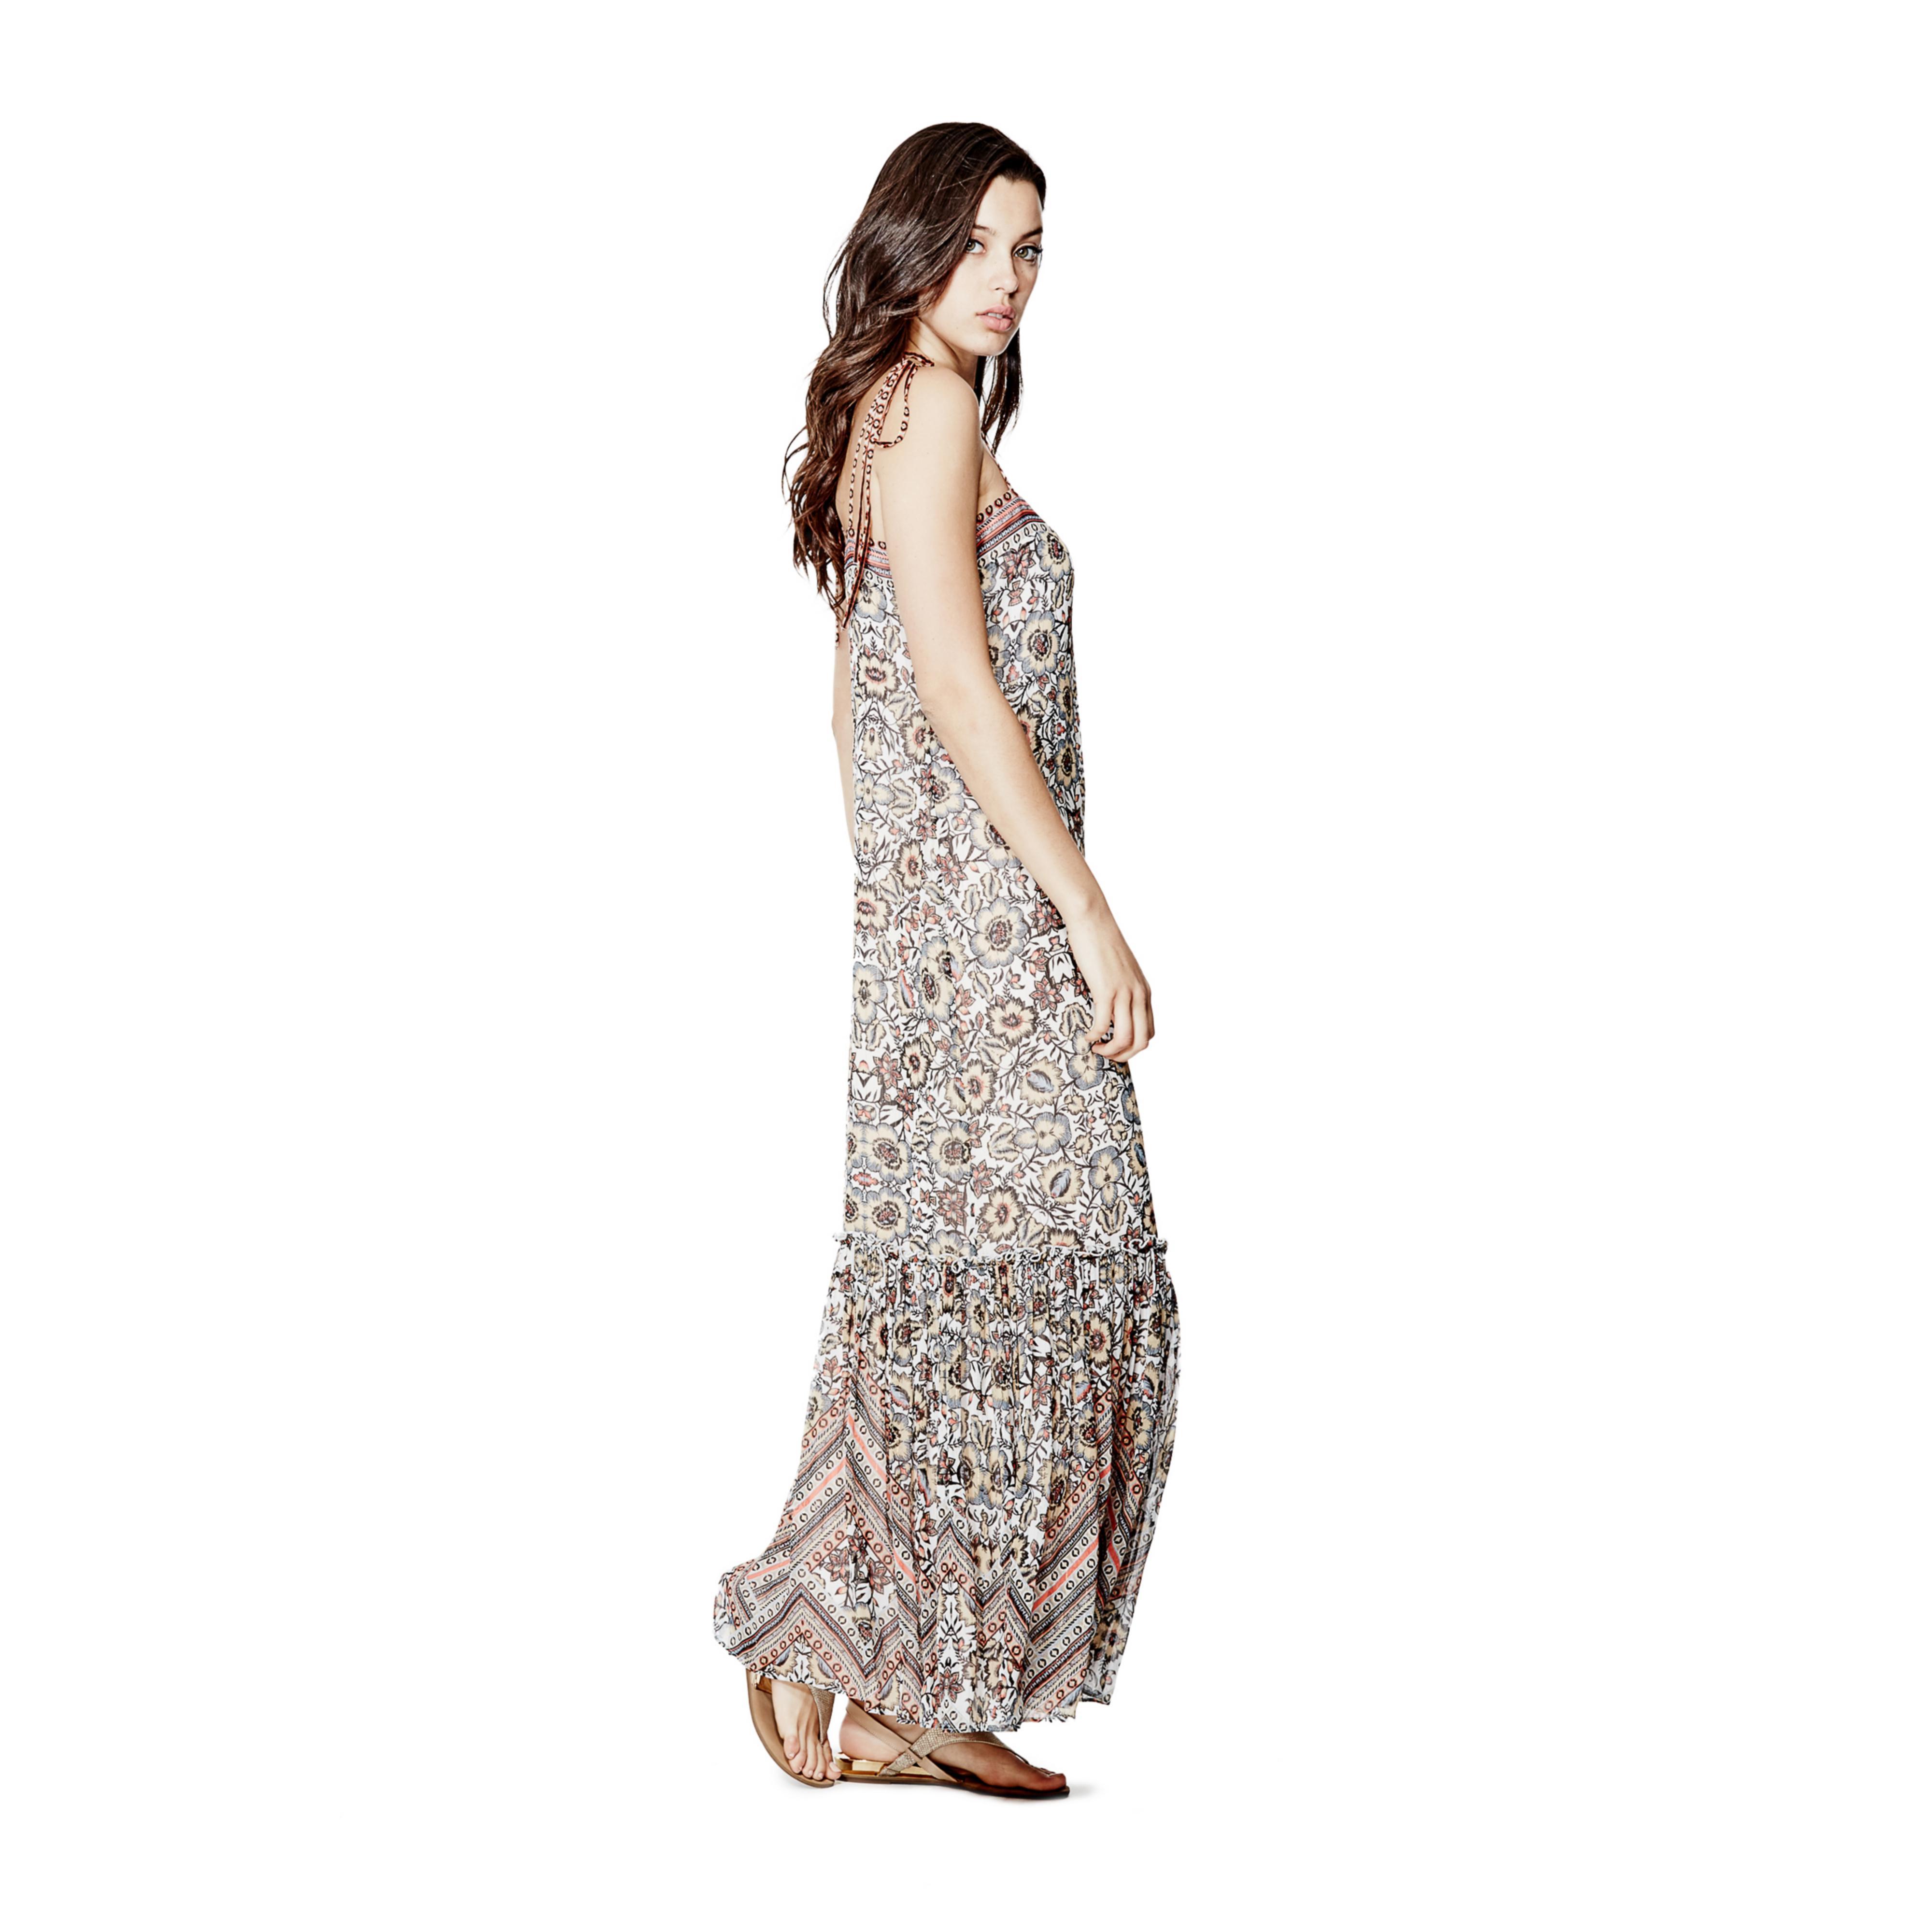 aa268596d7 Lyst - Guess Eris Sleeveless Maxi Dress in White